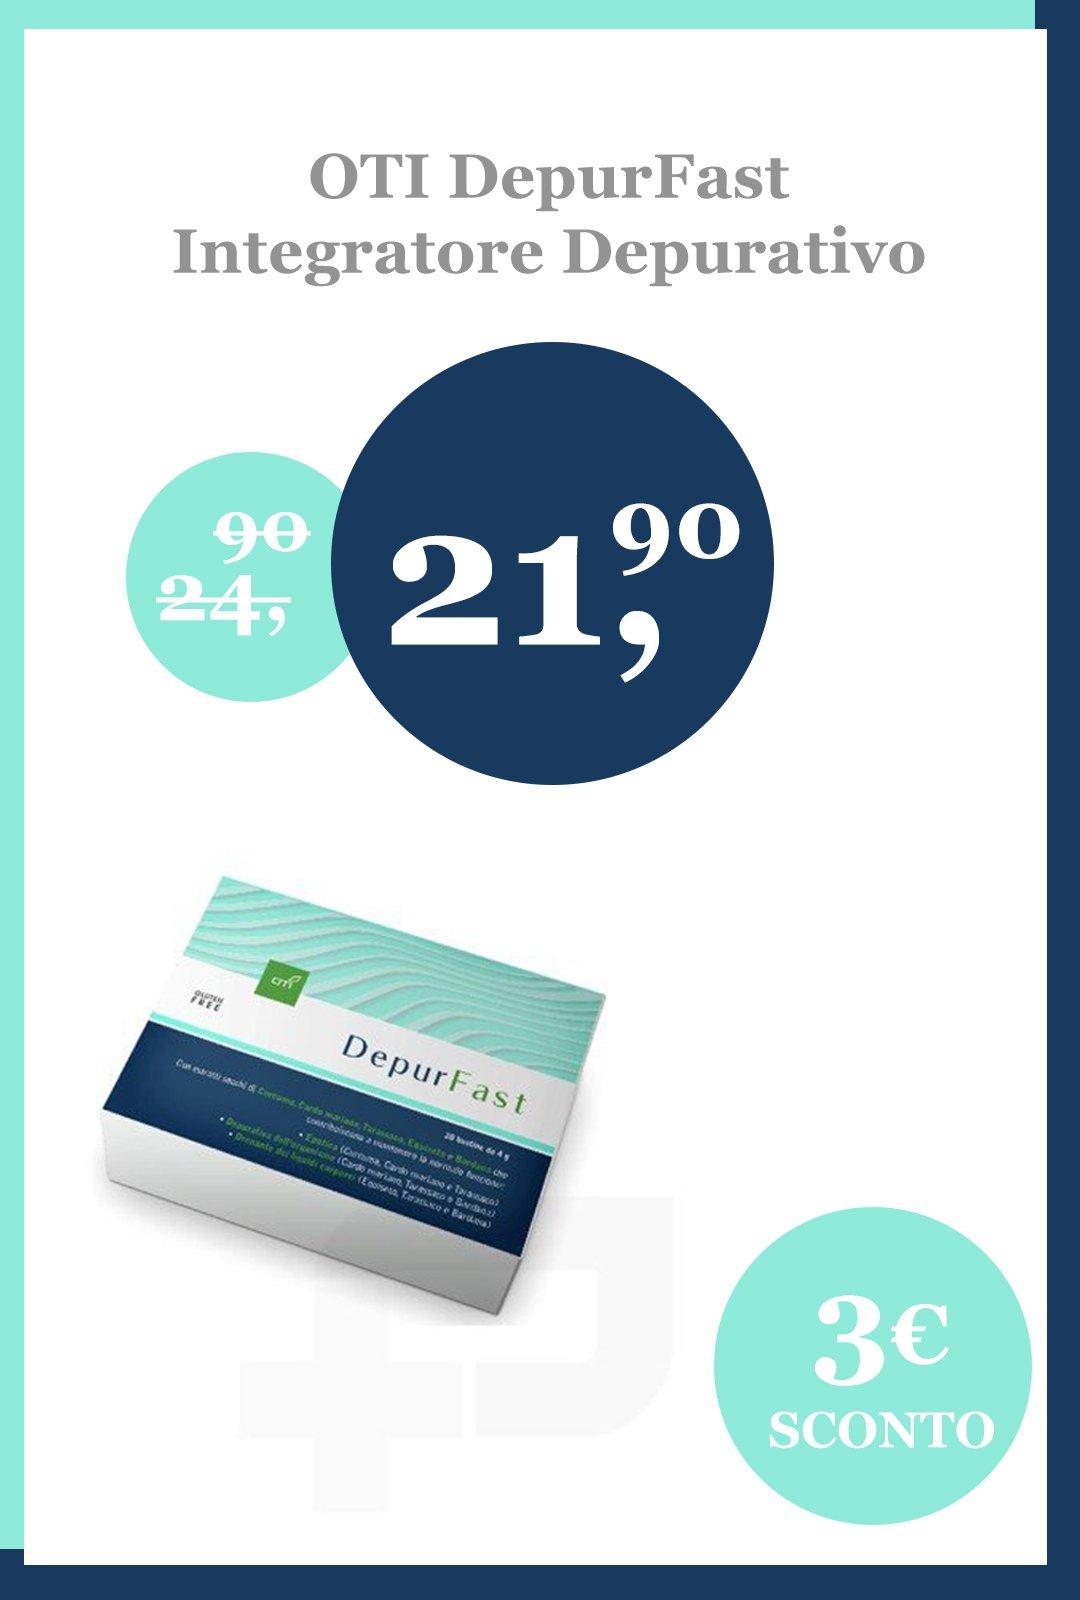 3€ di sconto su DepurFast Integratore Depurativo da 20 bustine